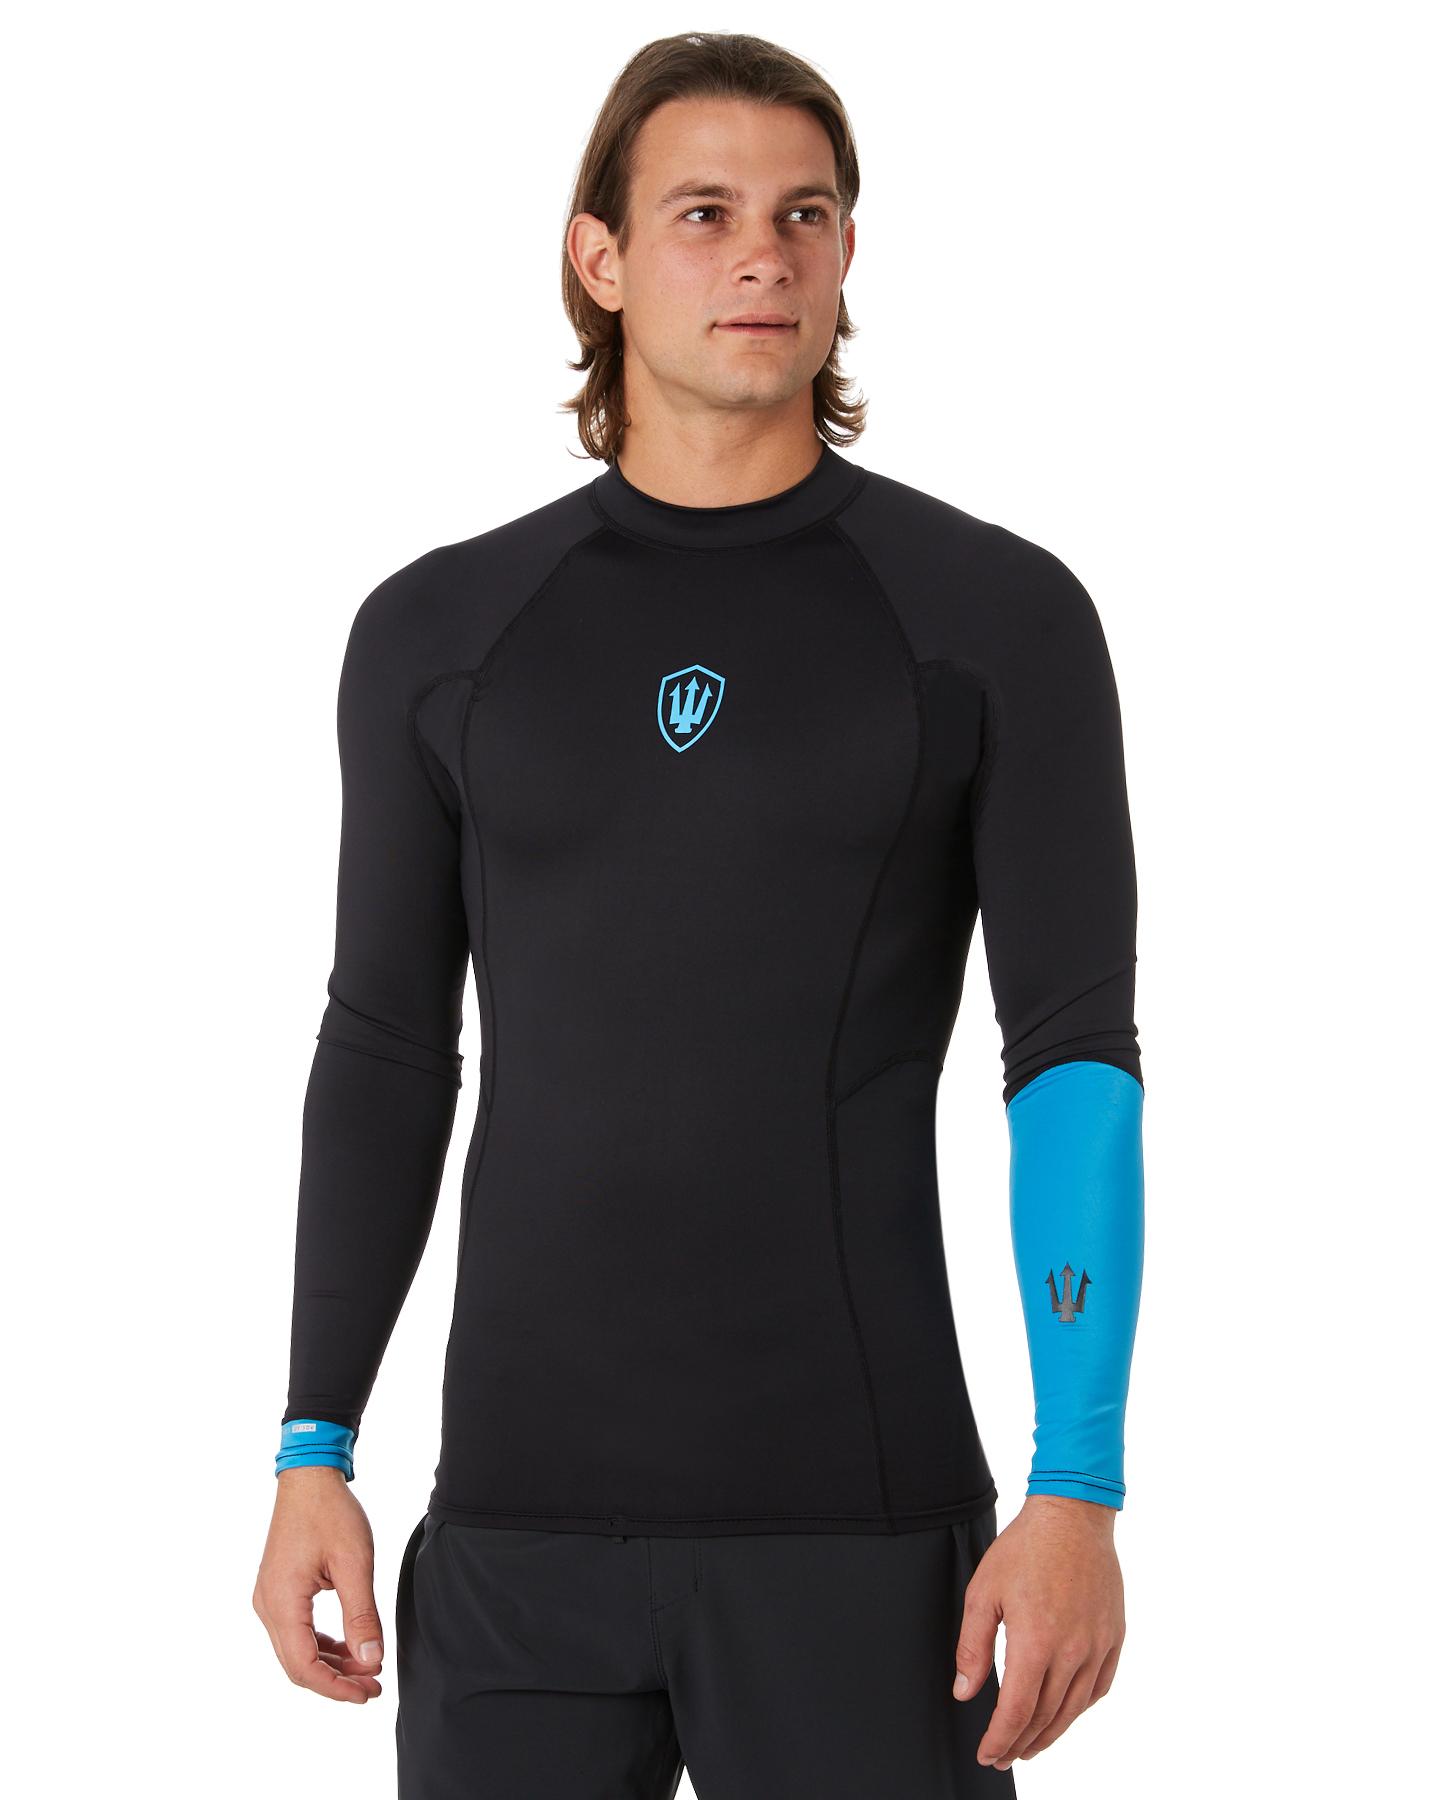 Fk Surf Performance X Ls Rash Shirt Black Blue